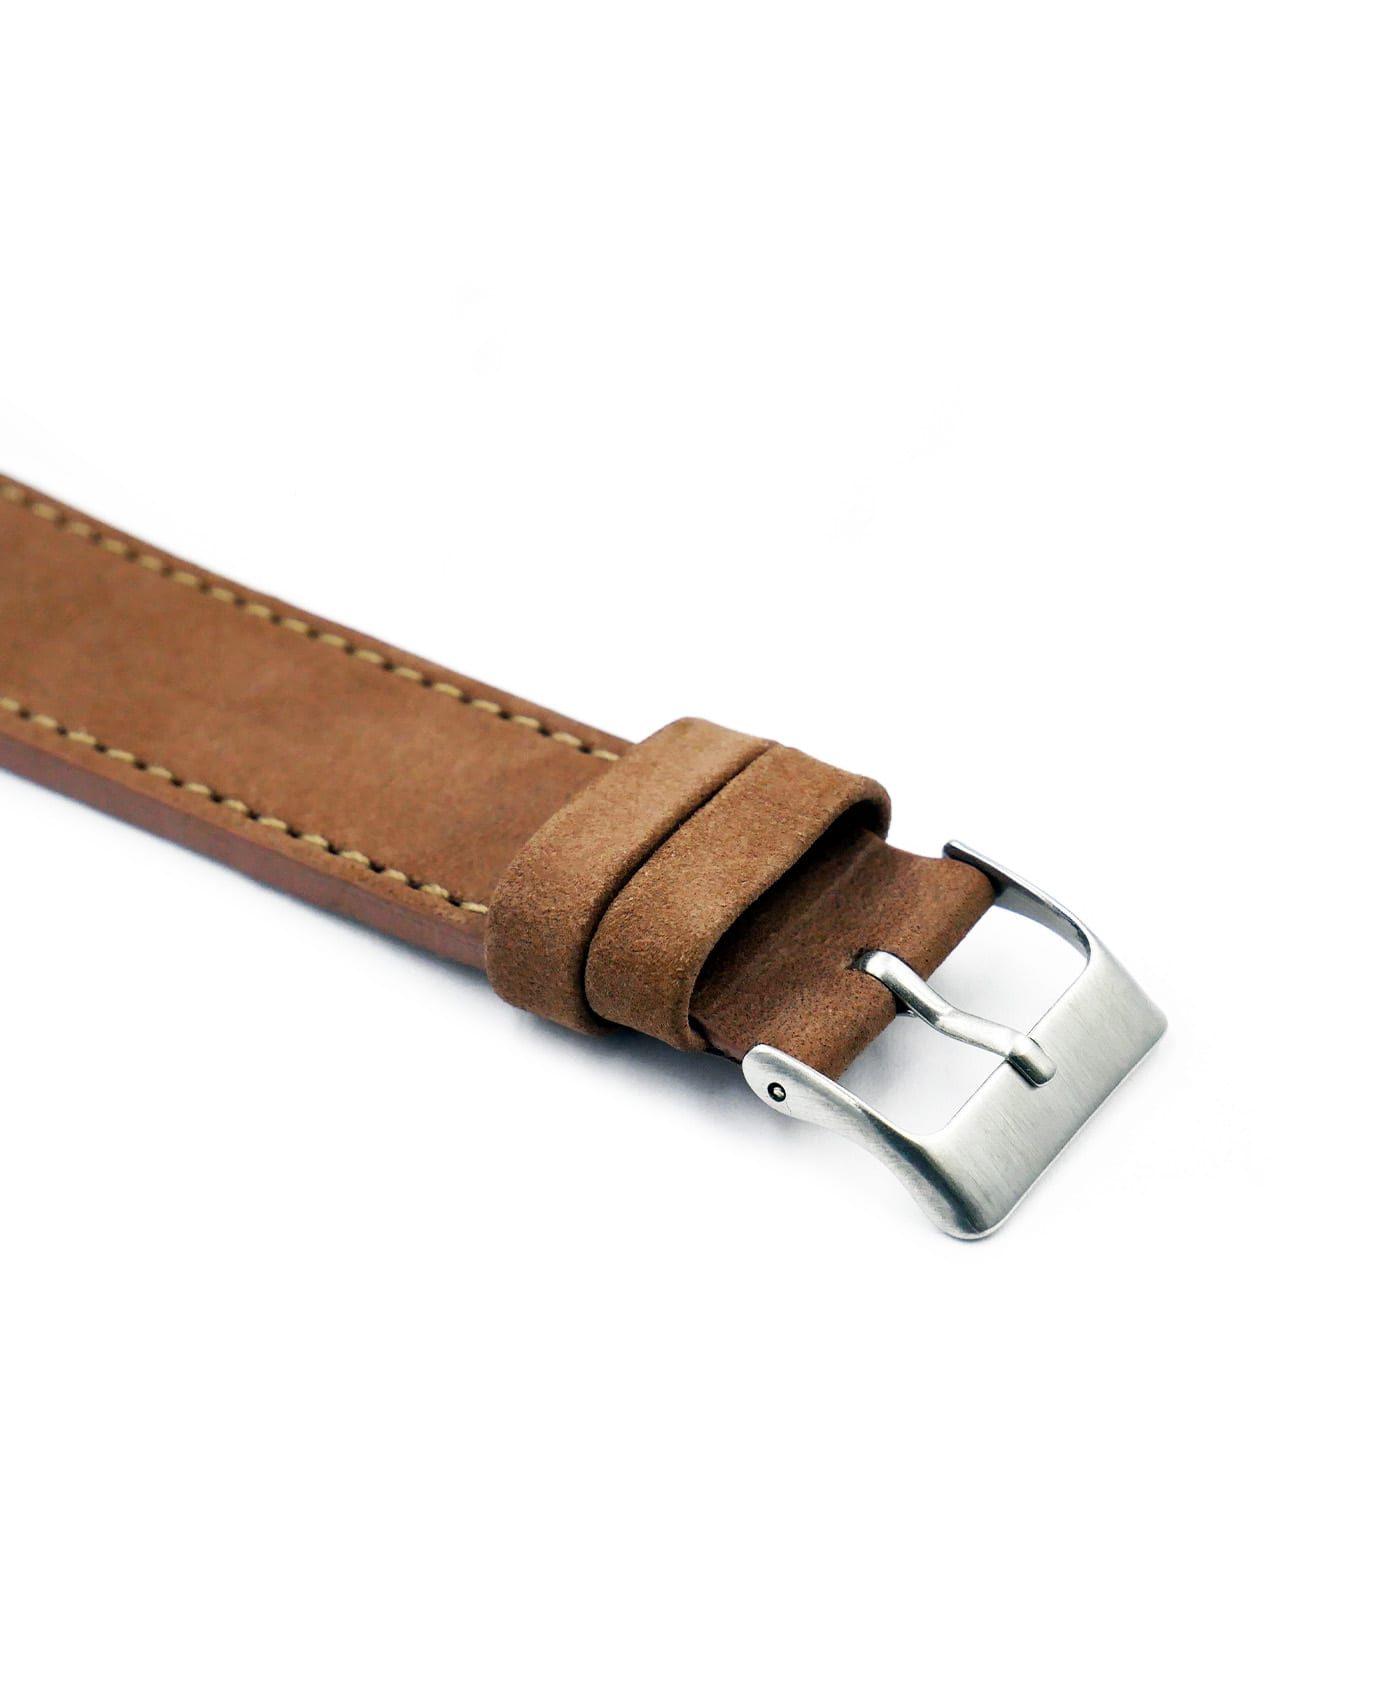 Pebro Premium Calfskin Watch Strap Hazelnut/Brown No 191 close up buckle